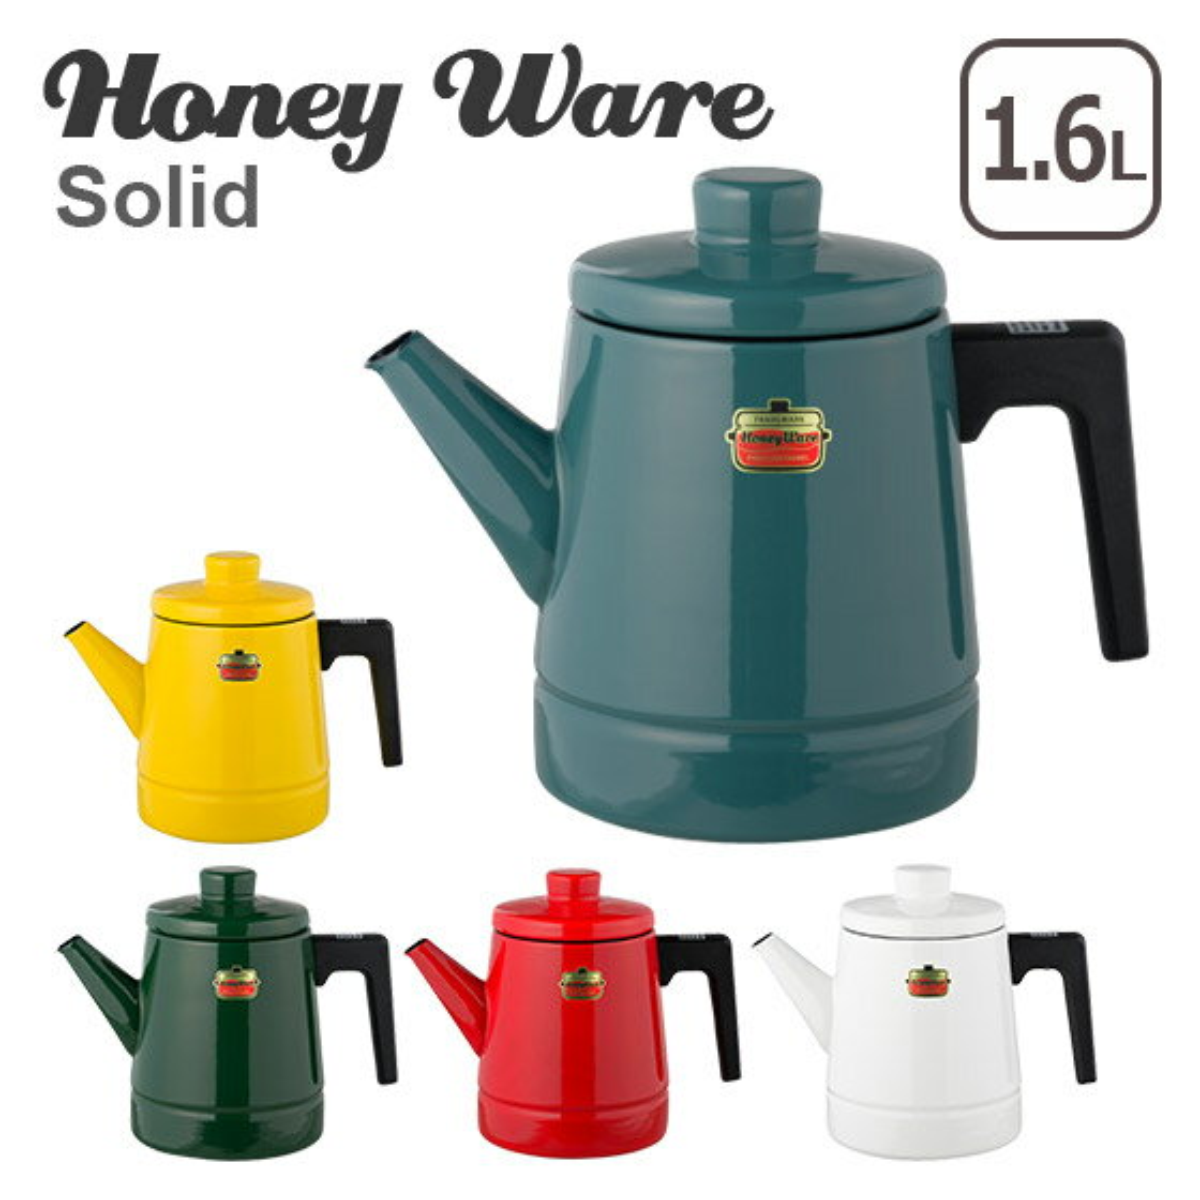 Honey Ware(ハニーウェア)Solid 1.6L コーヒーポット レッド イエロー ホワイト グリーン スモークブルー 富士ホーロー [IH可能]ソリッド【楽ギフ_包装】【楽ギフ_のし宛書】【北海道・沖縄は別途540円加算】